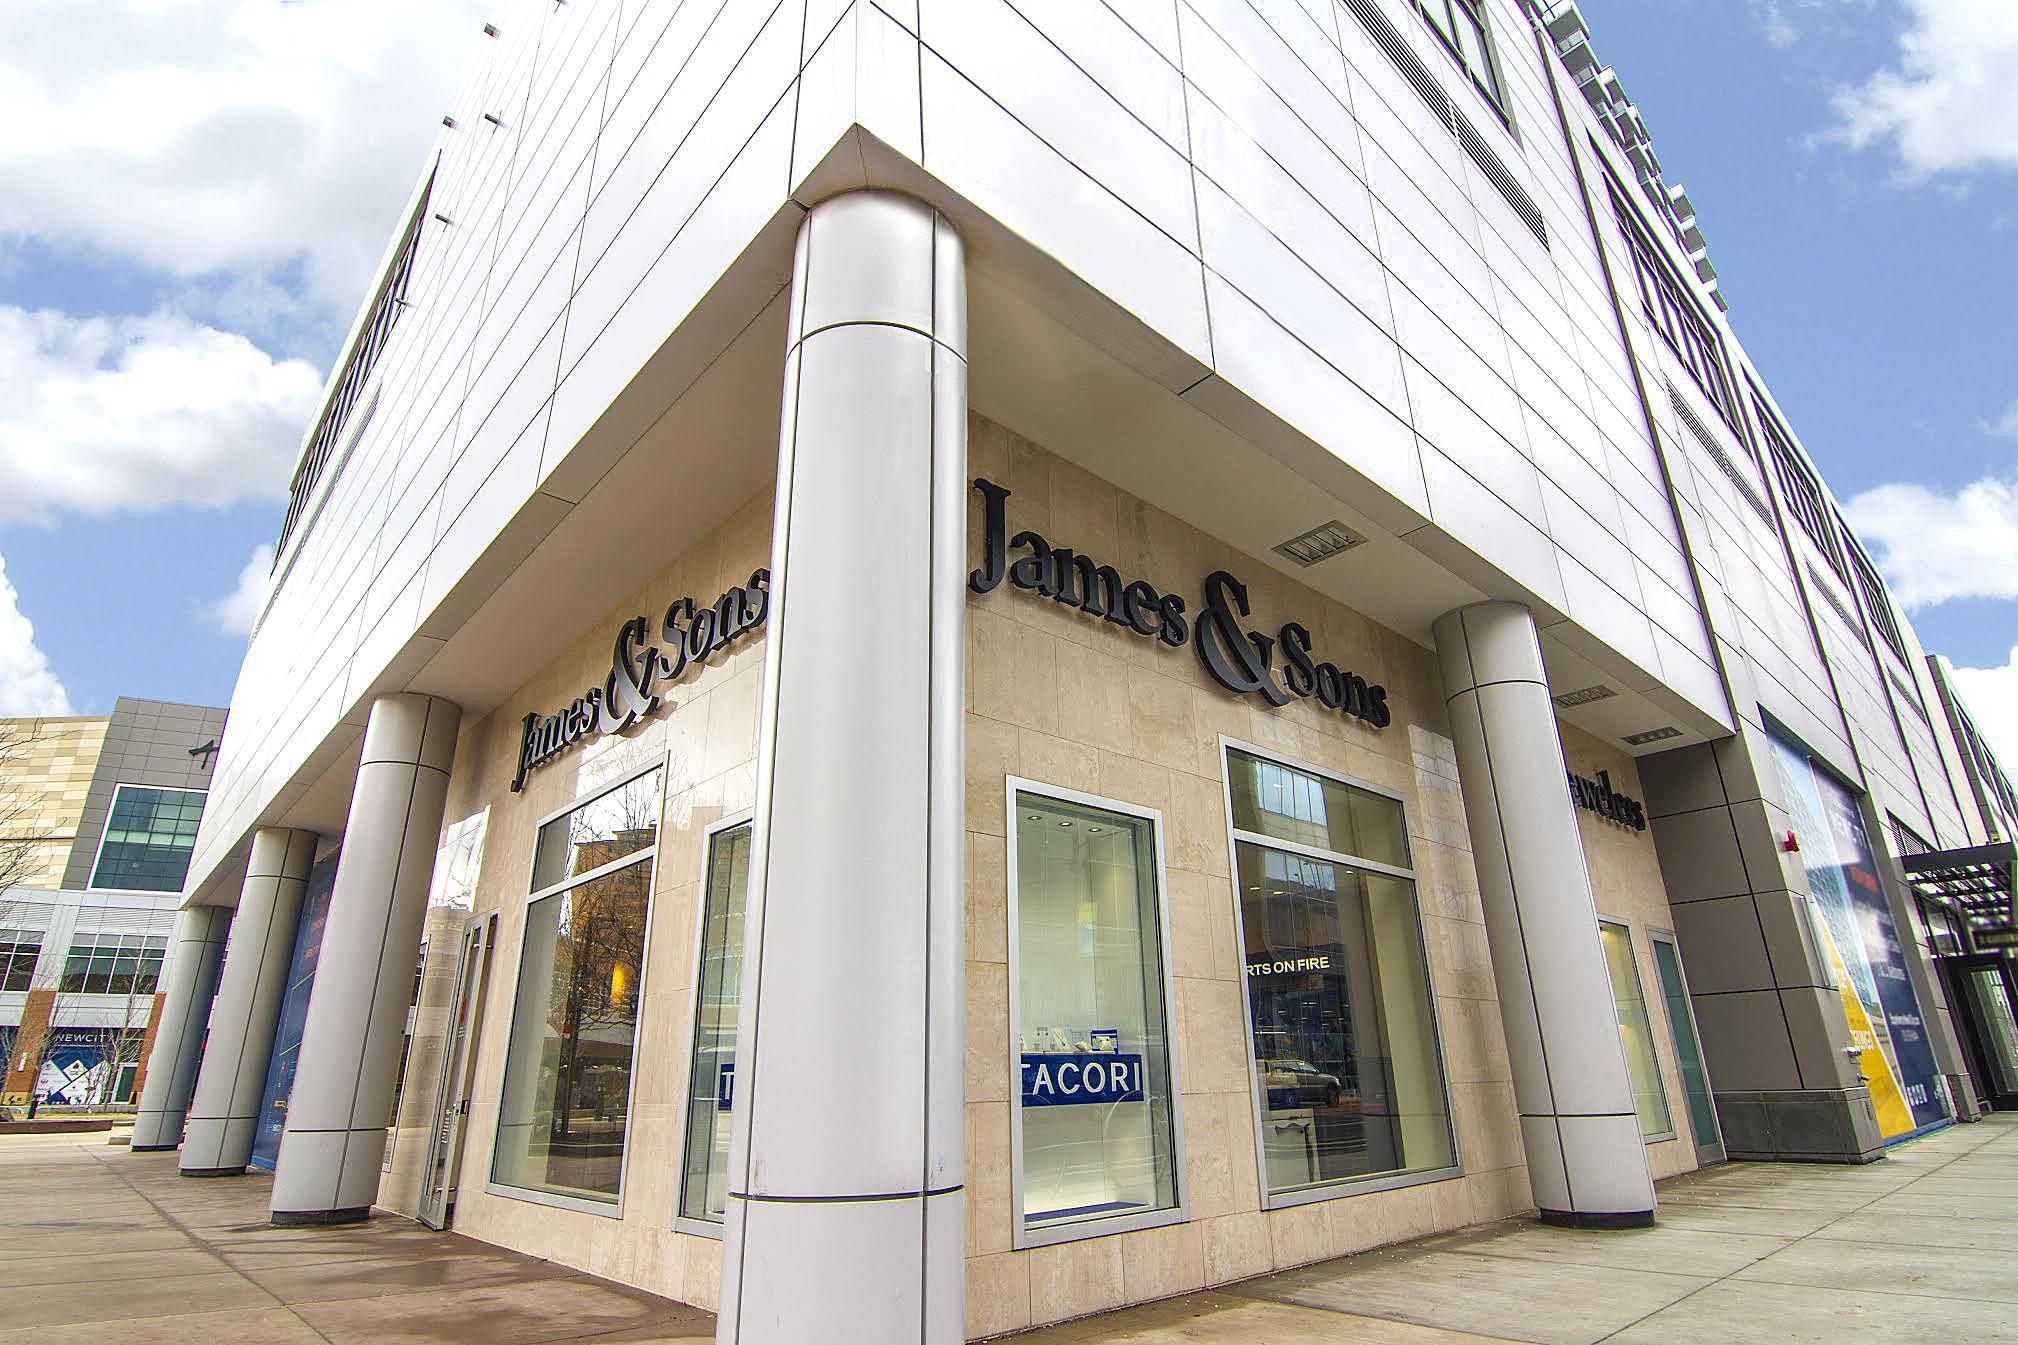 James & Sons Fine Jewelers